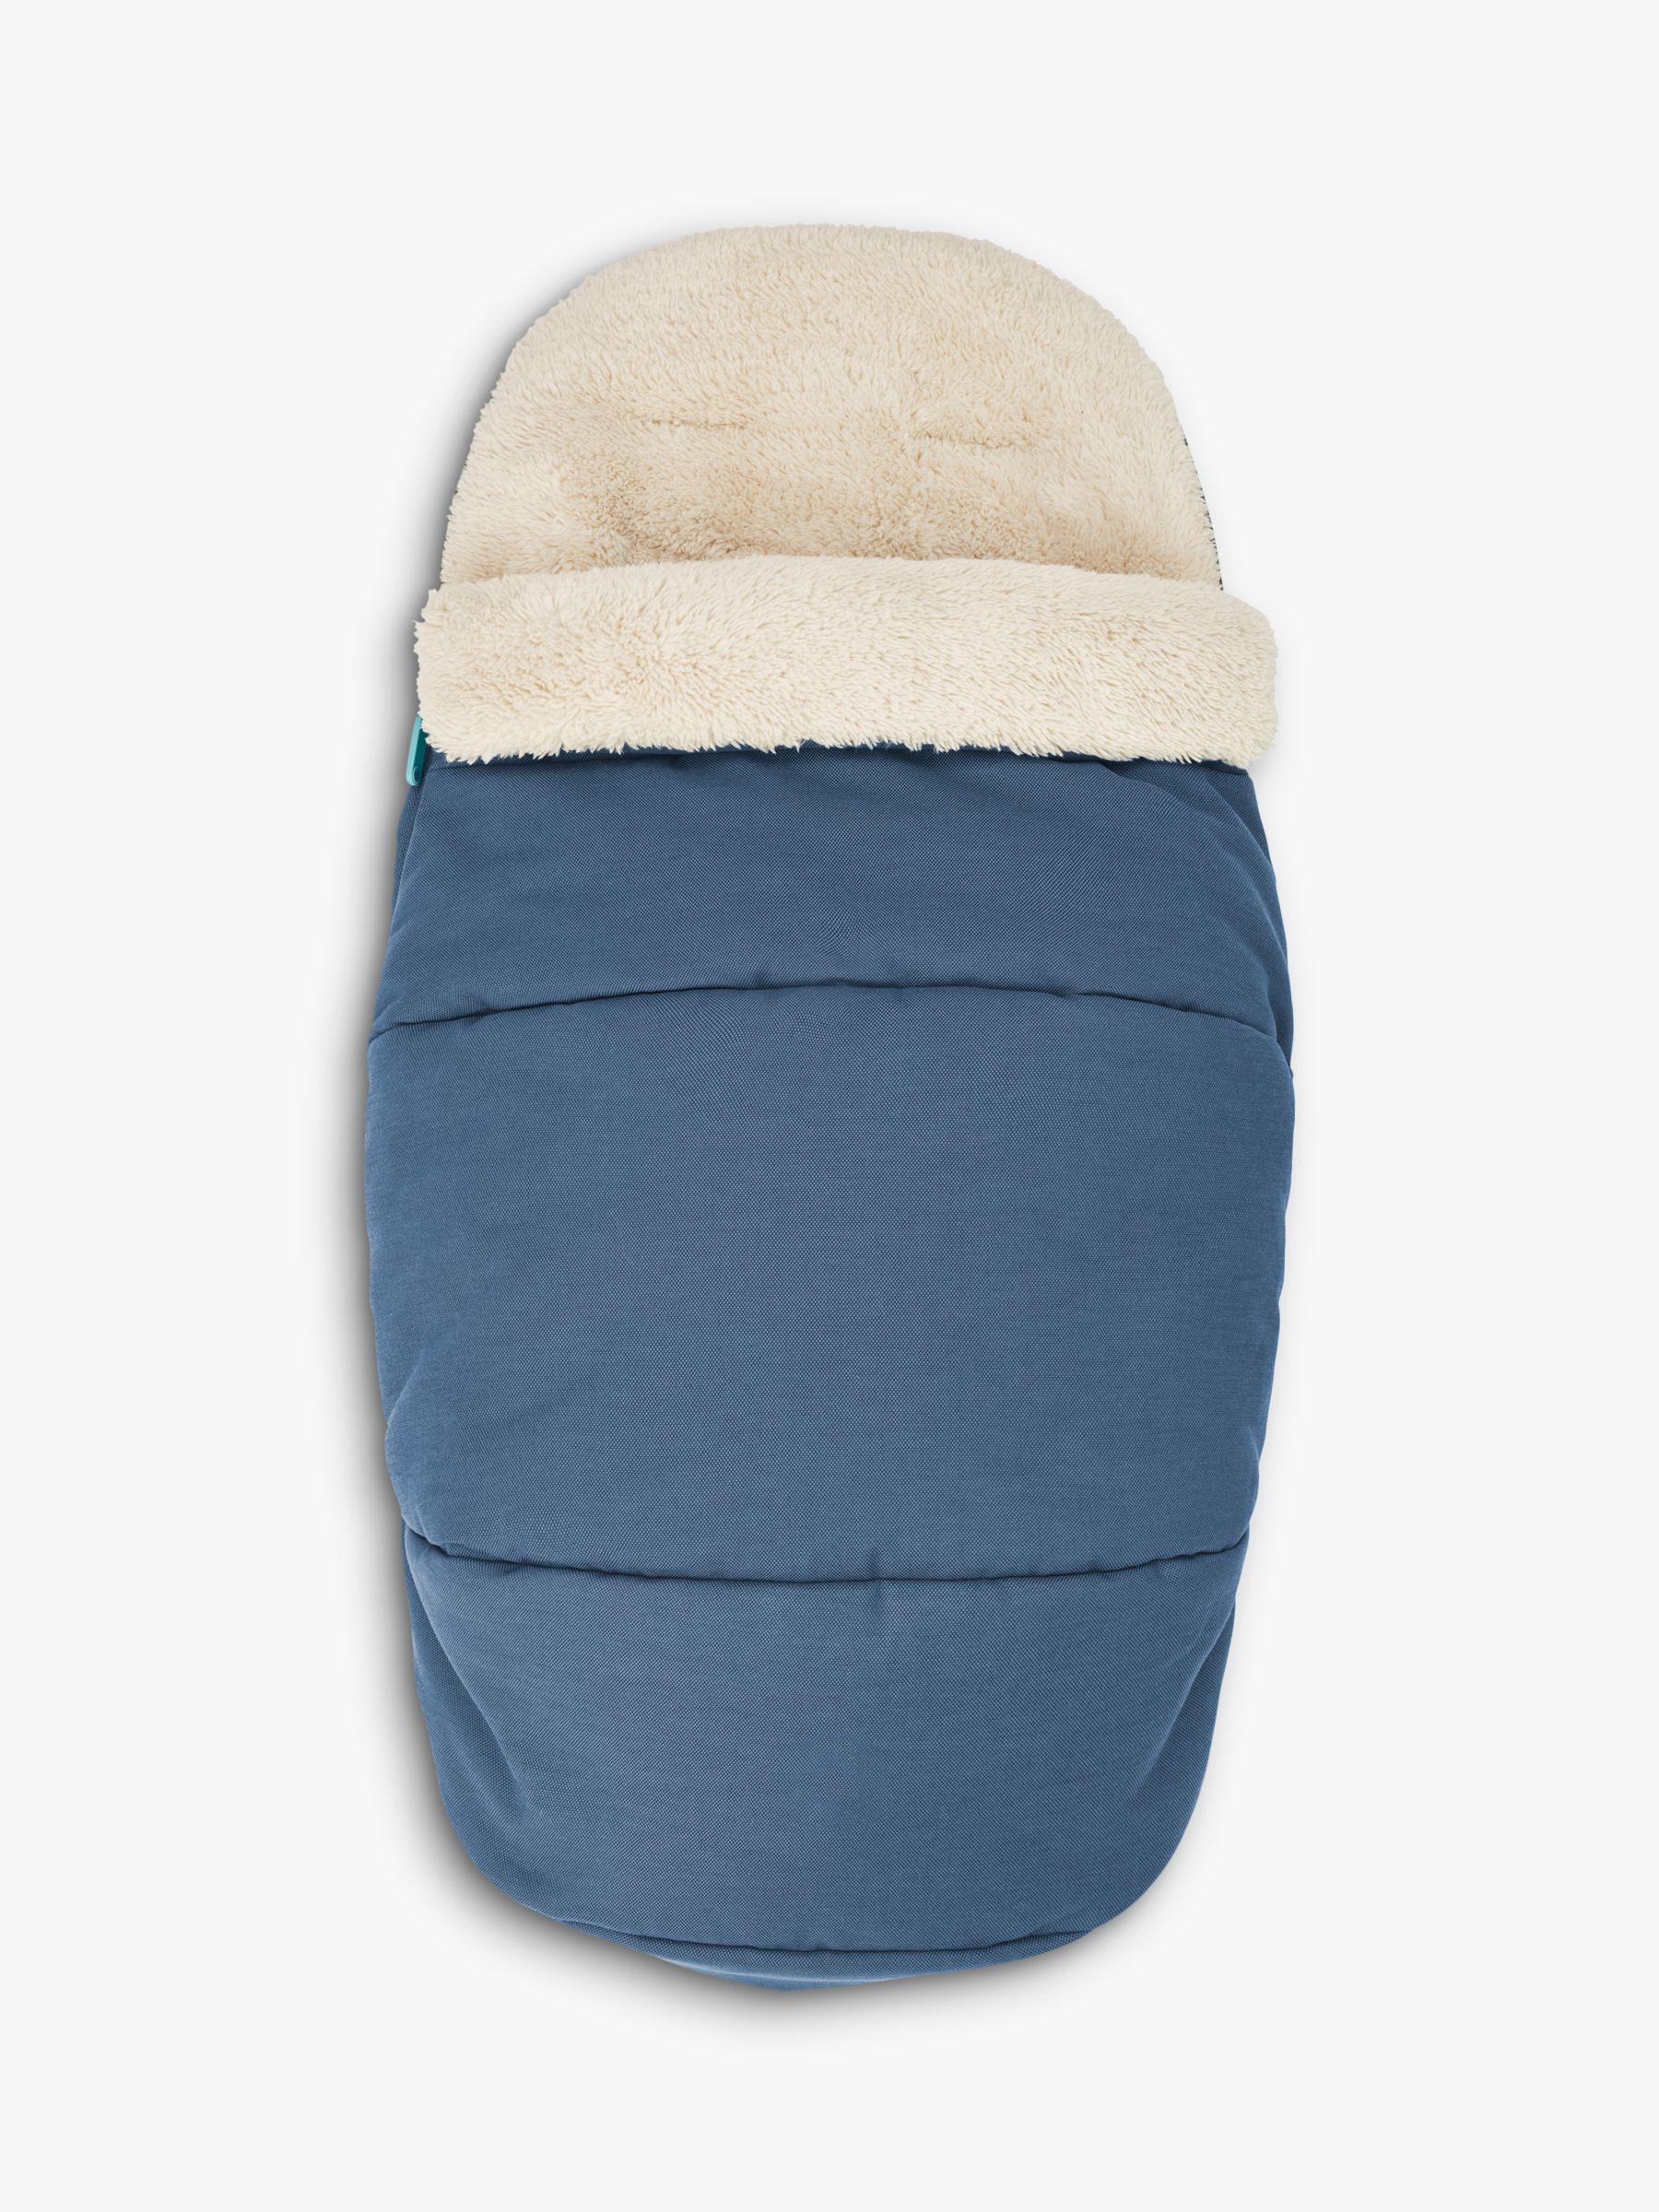 Maxi-Cosi Maxi-Cosi 2 in 1 Pushchair Footmuff, Essential Blue